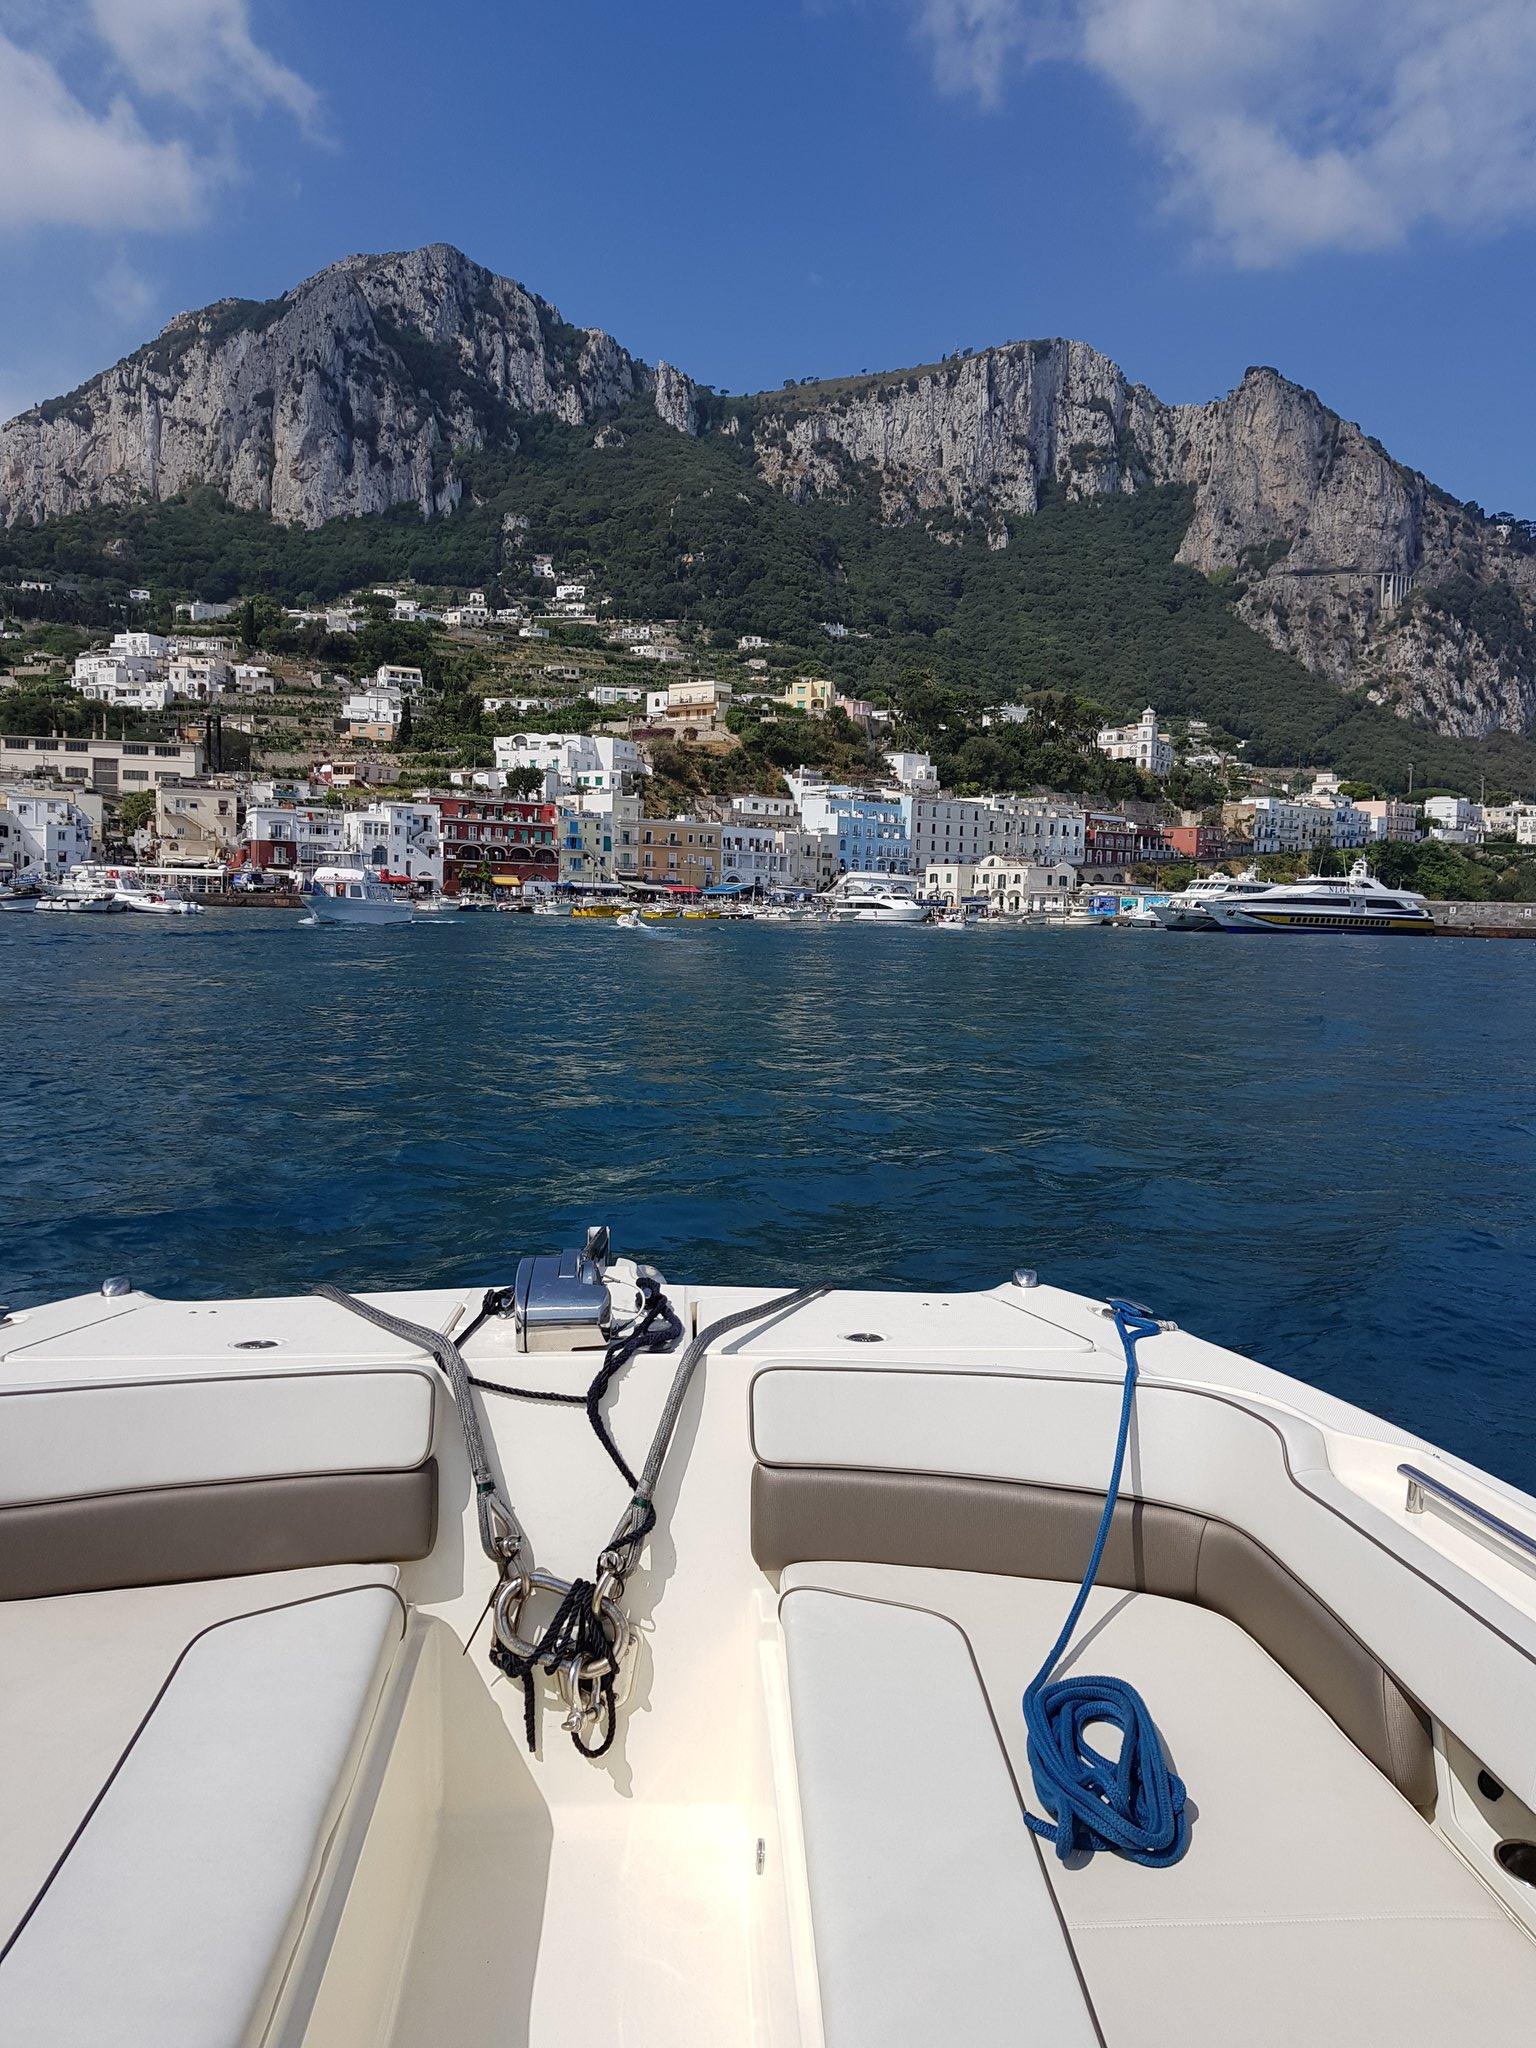 Arrived Capri https://t.co/aWBMqKCcGr